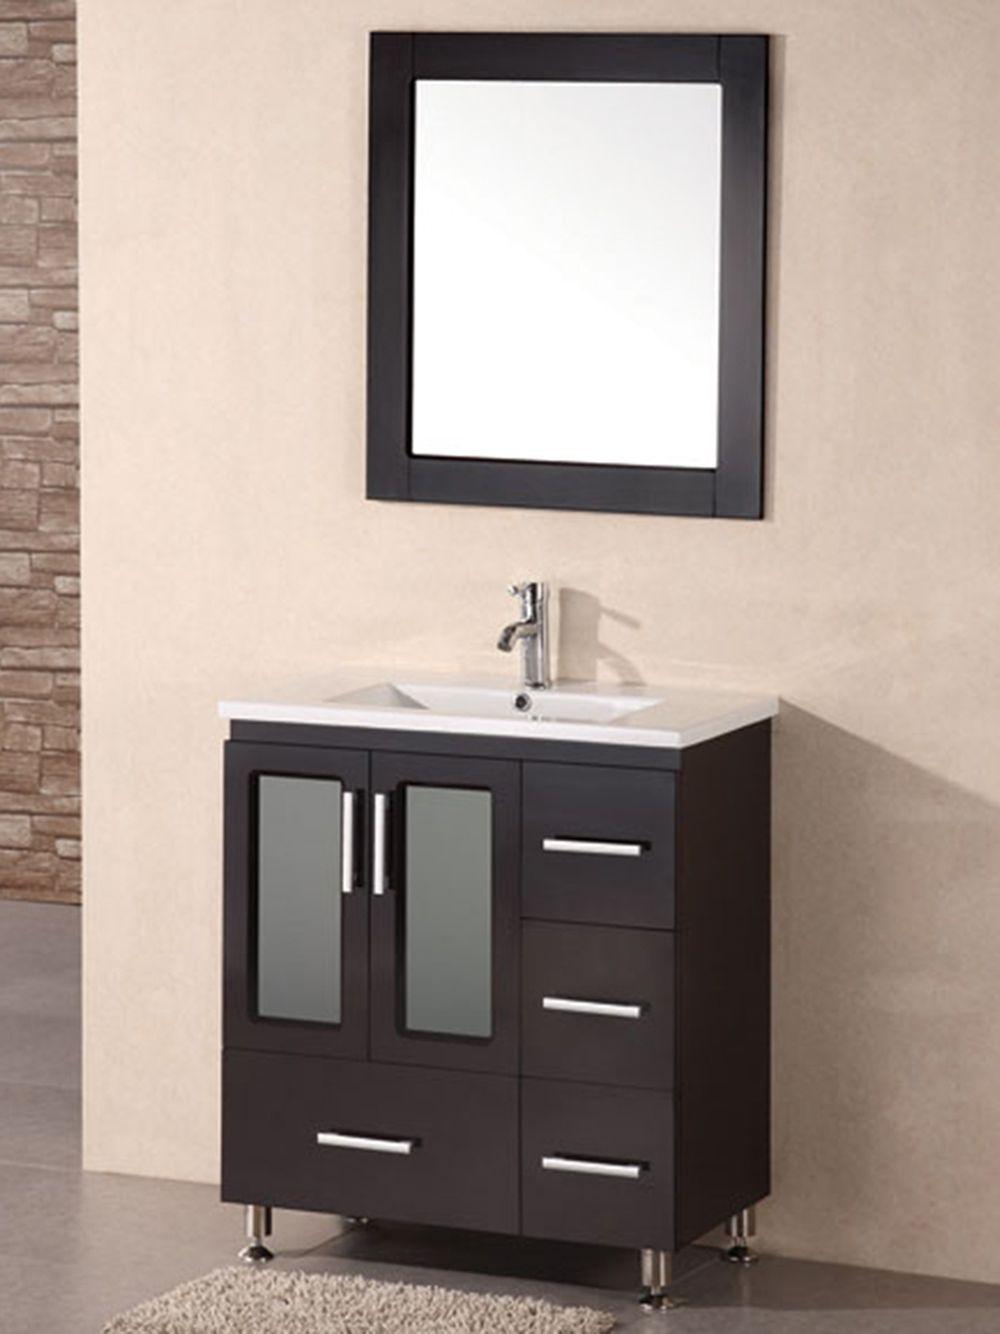 Applying Narrow Bathroom Vanity Ideas with Premium Service